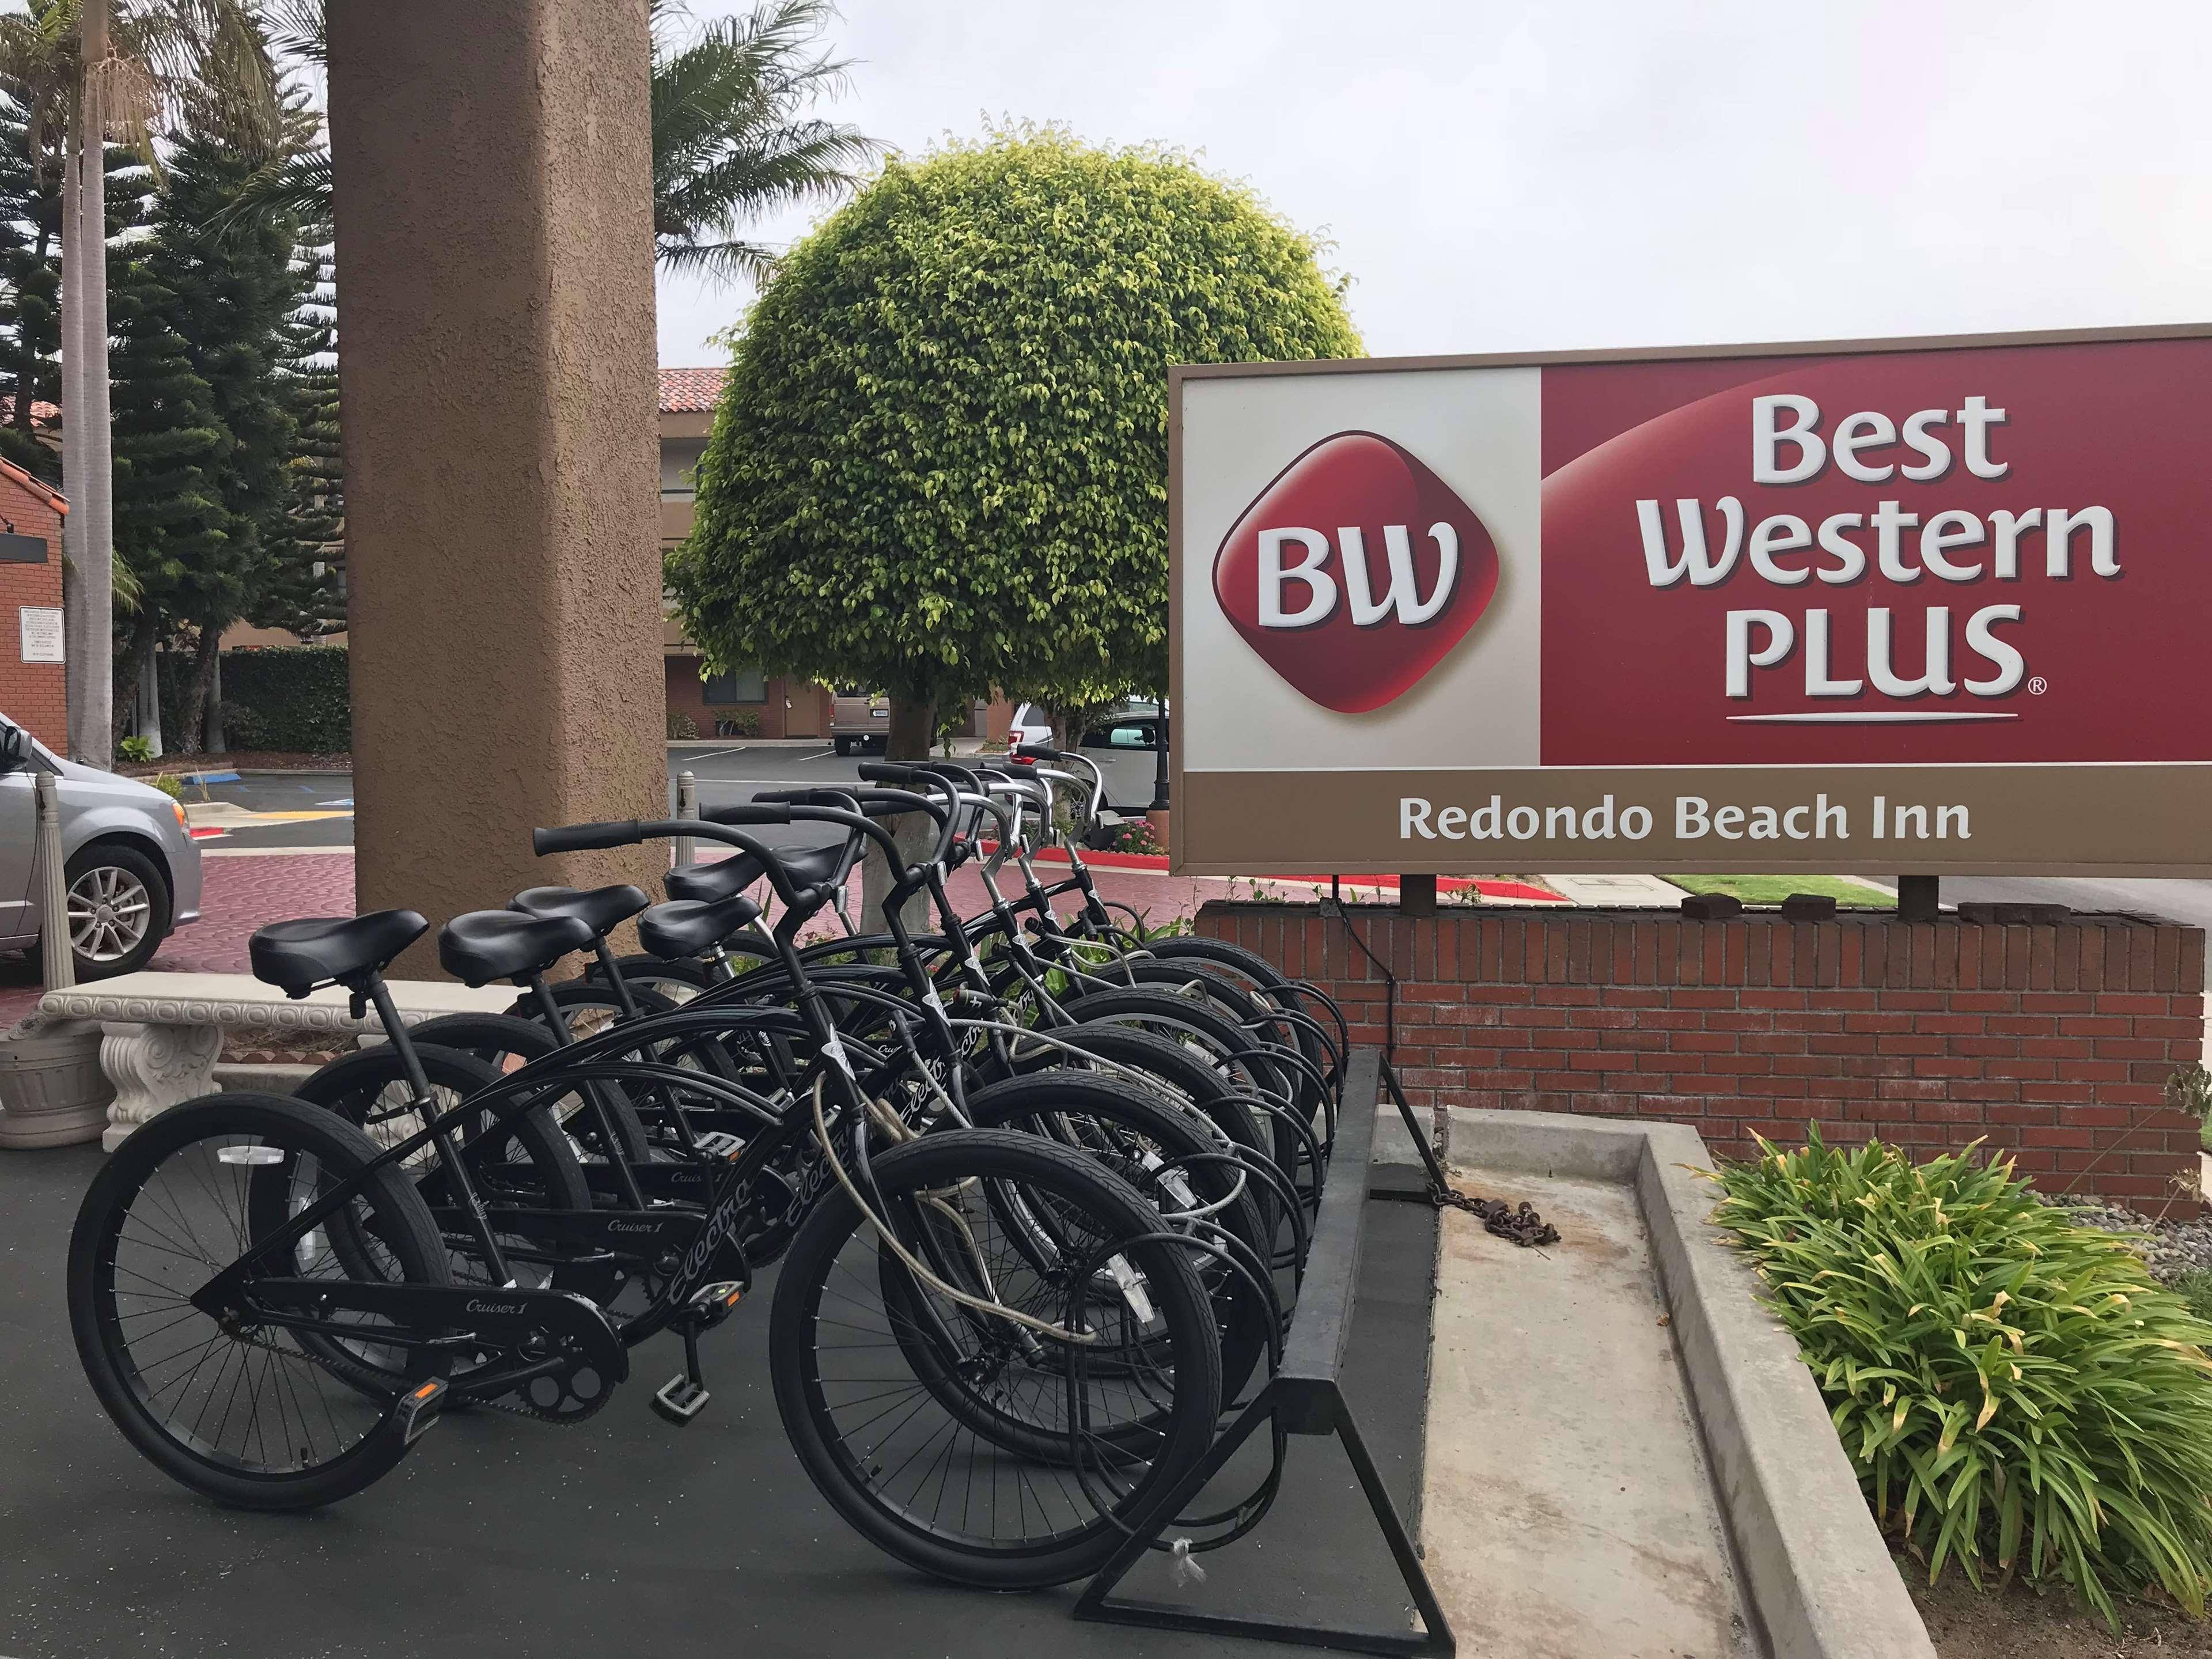 Best Western Plus Redondo Beach Inn image 6